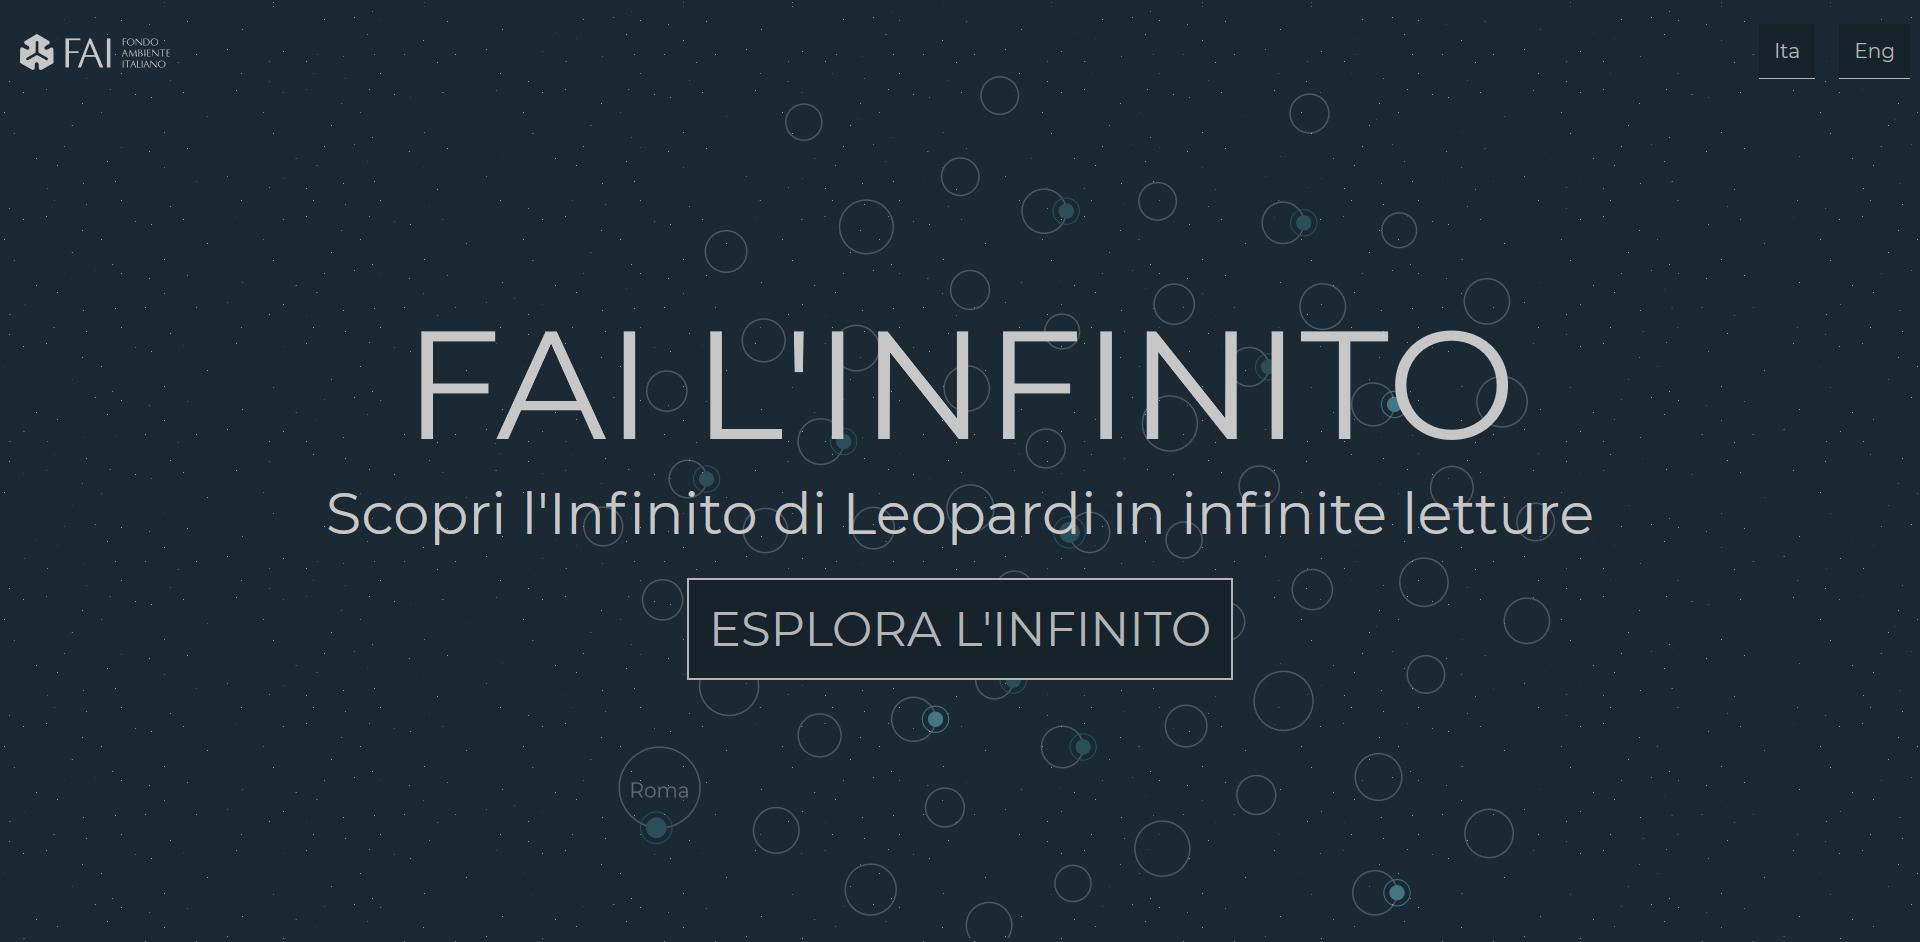 FAI Infinito